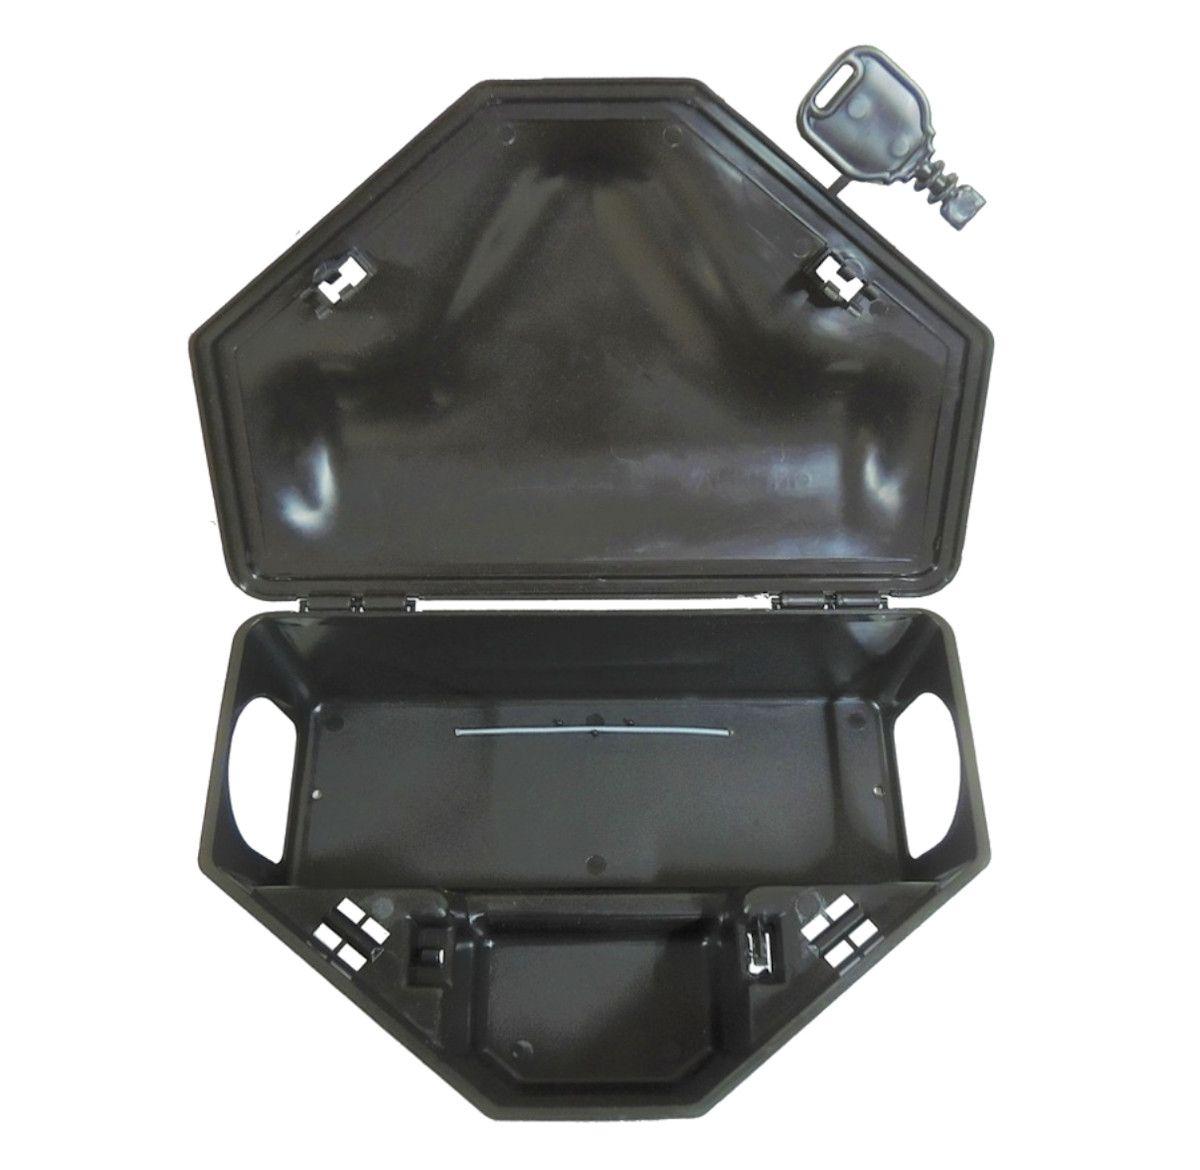 Kit 25 Porta Isca Com 2 Chaves - Duplo Travamento